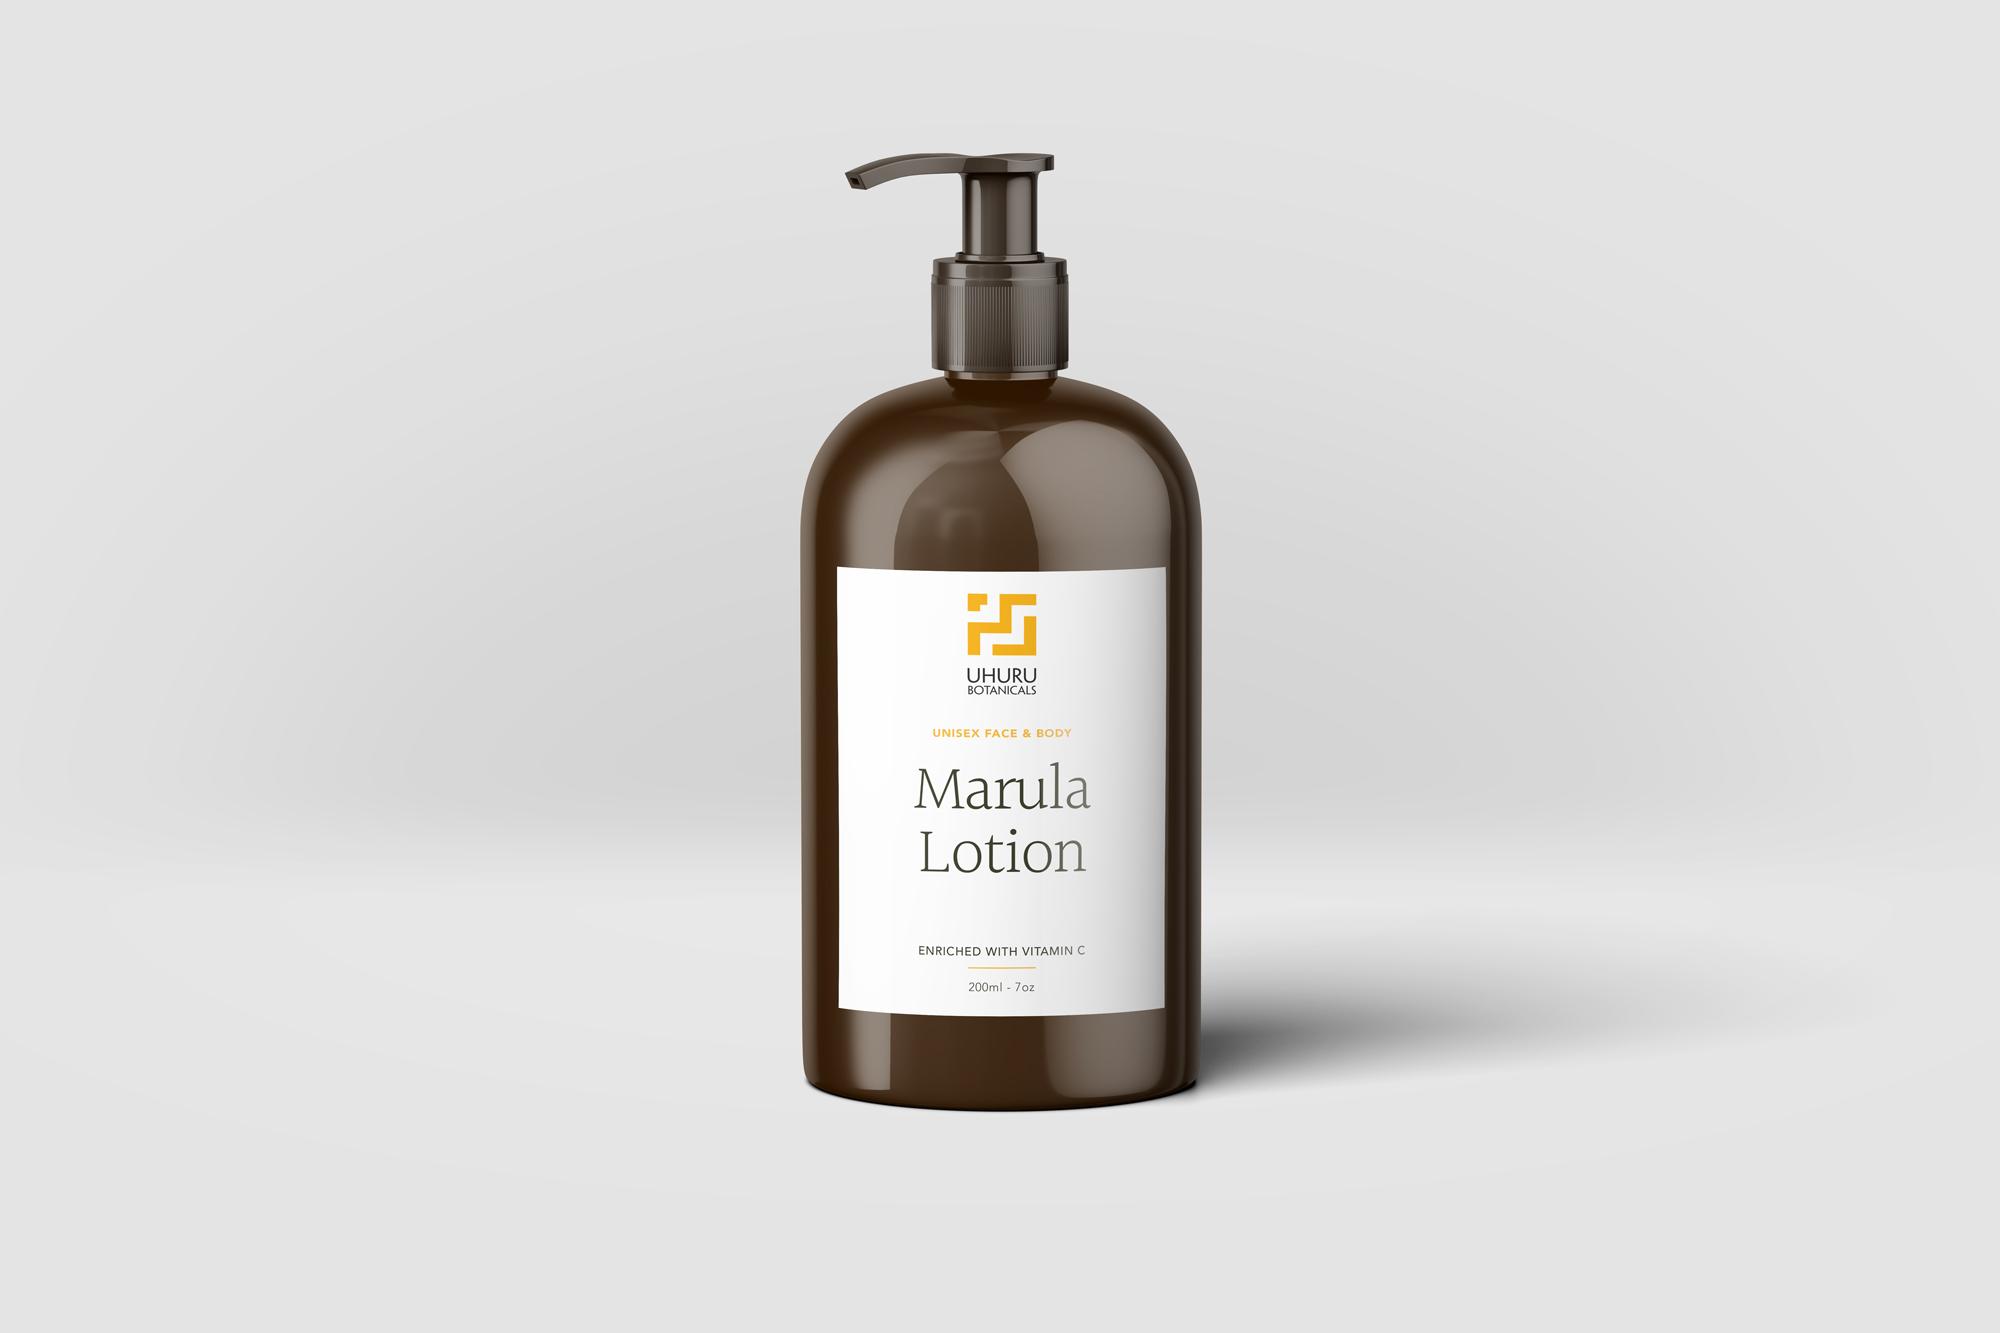 uhuru-botanicals-label-packaging-design-marula-lotion-studio-77-london.jpg